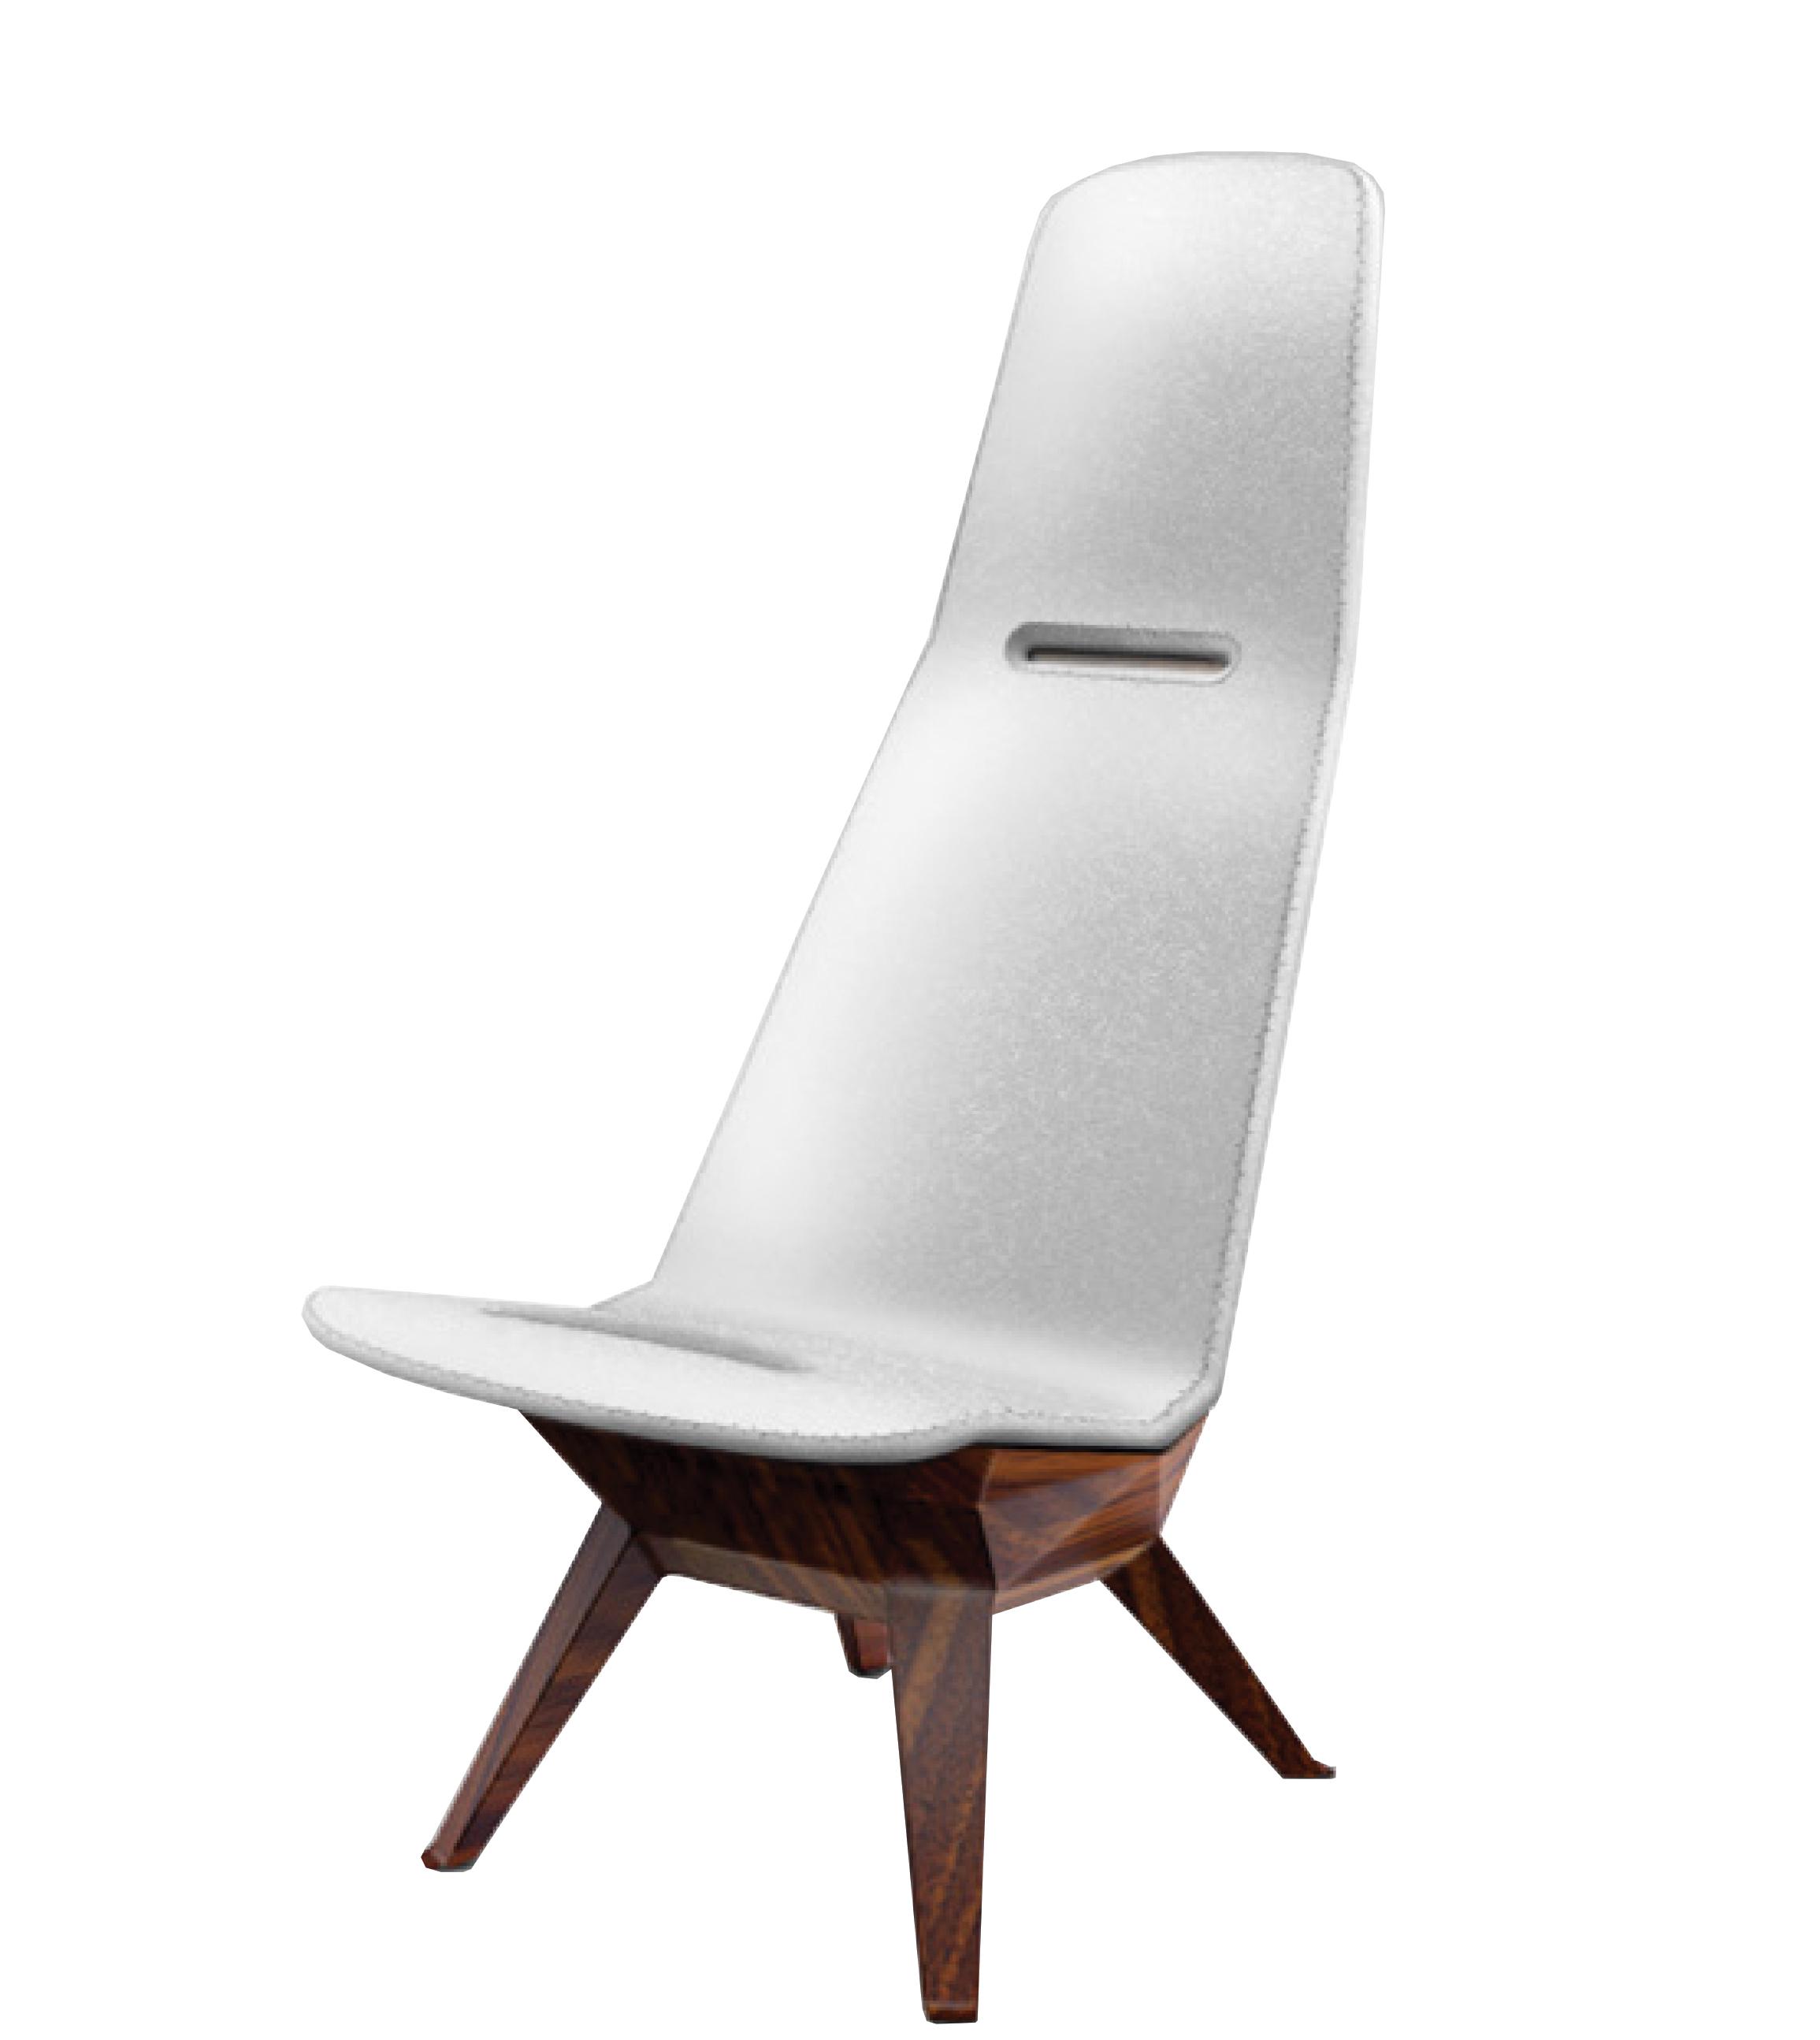 Sitting Pretty: UC DAAP Student Chair Designs - Cincinnati Magazine